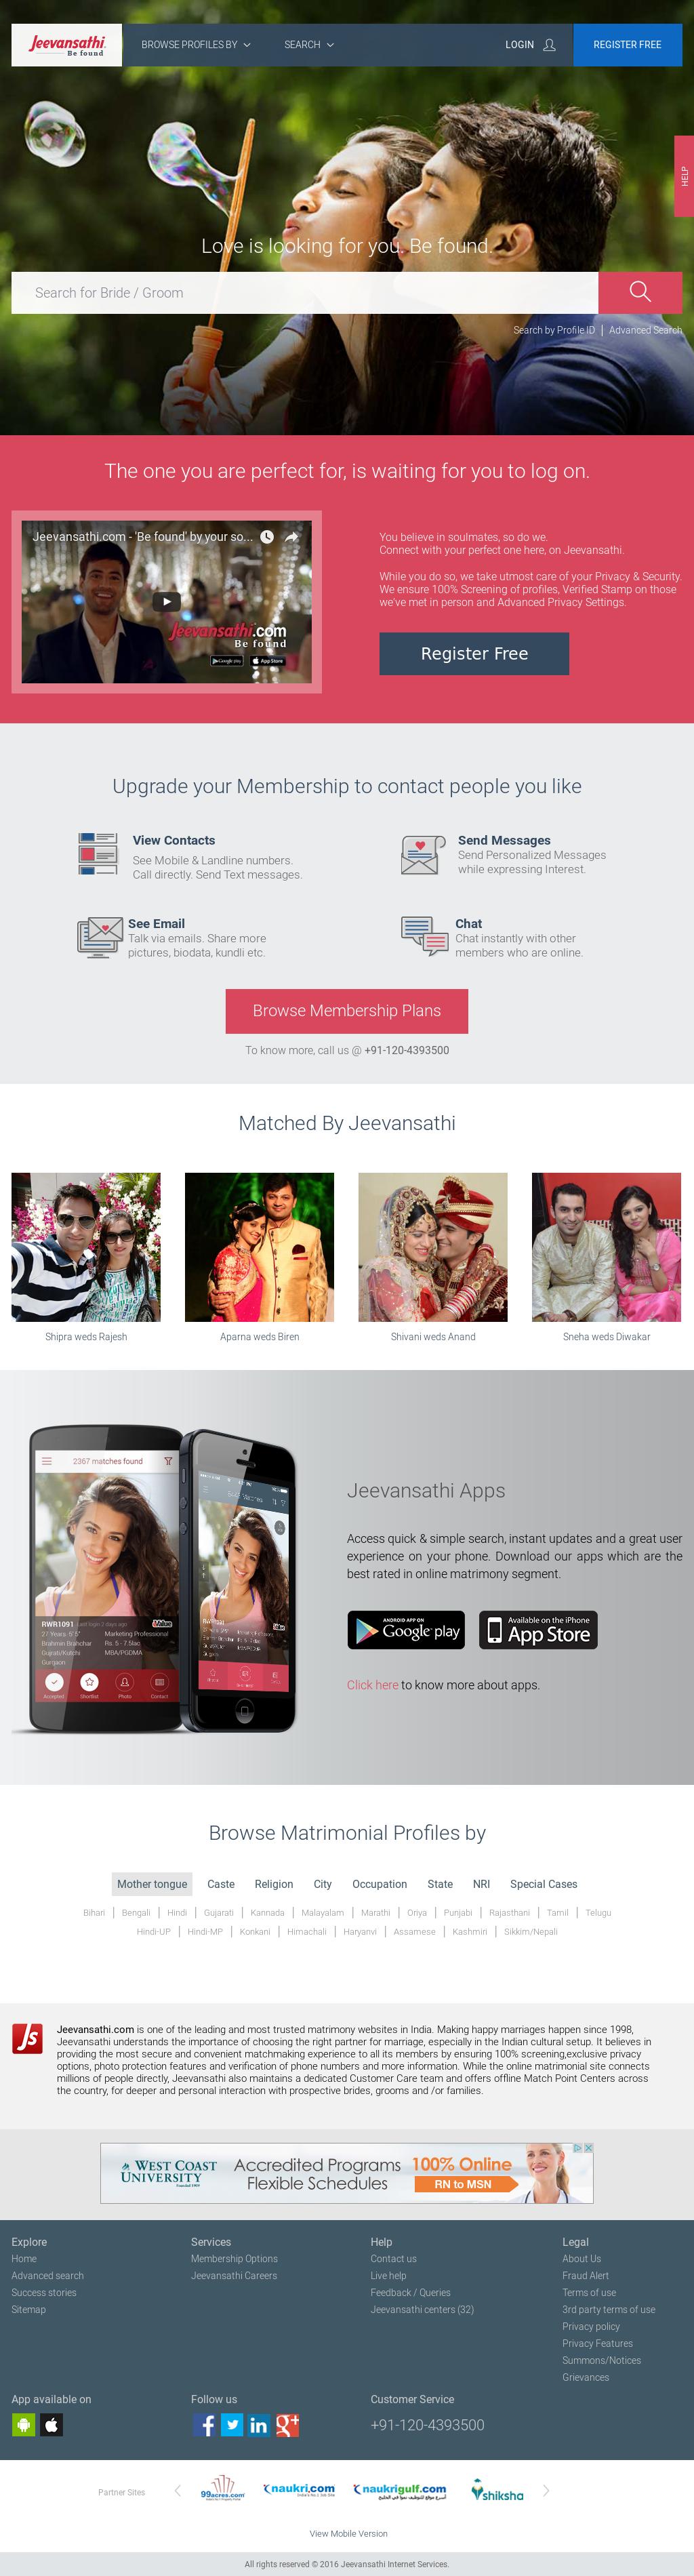 jeevansathi matchmaking